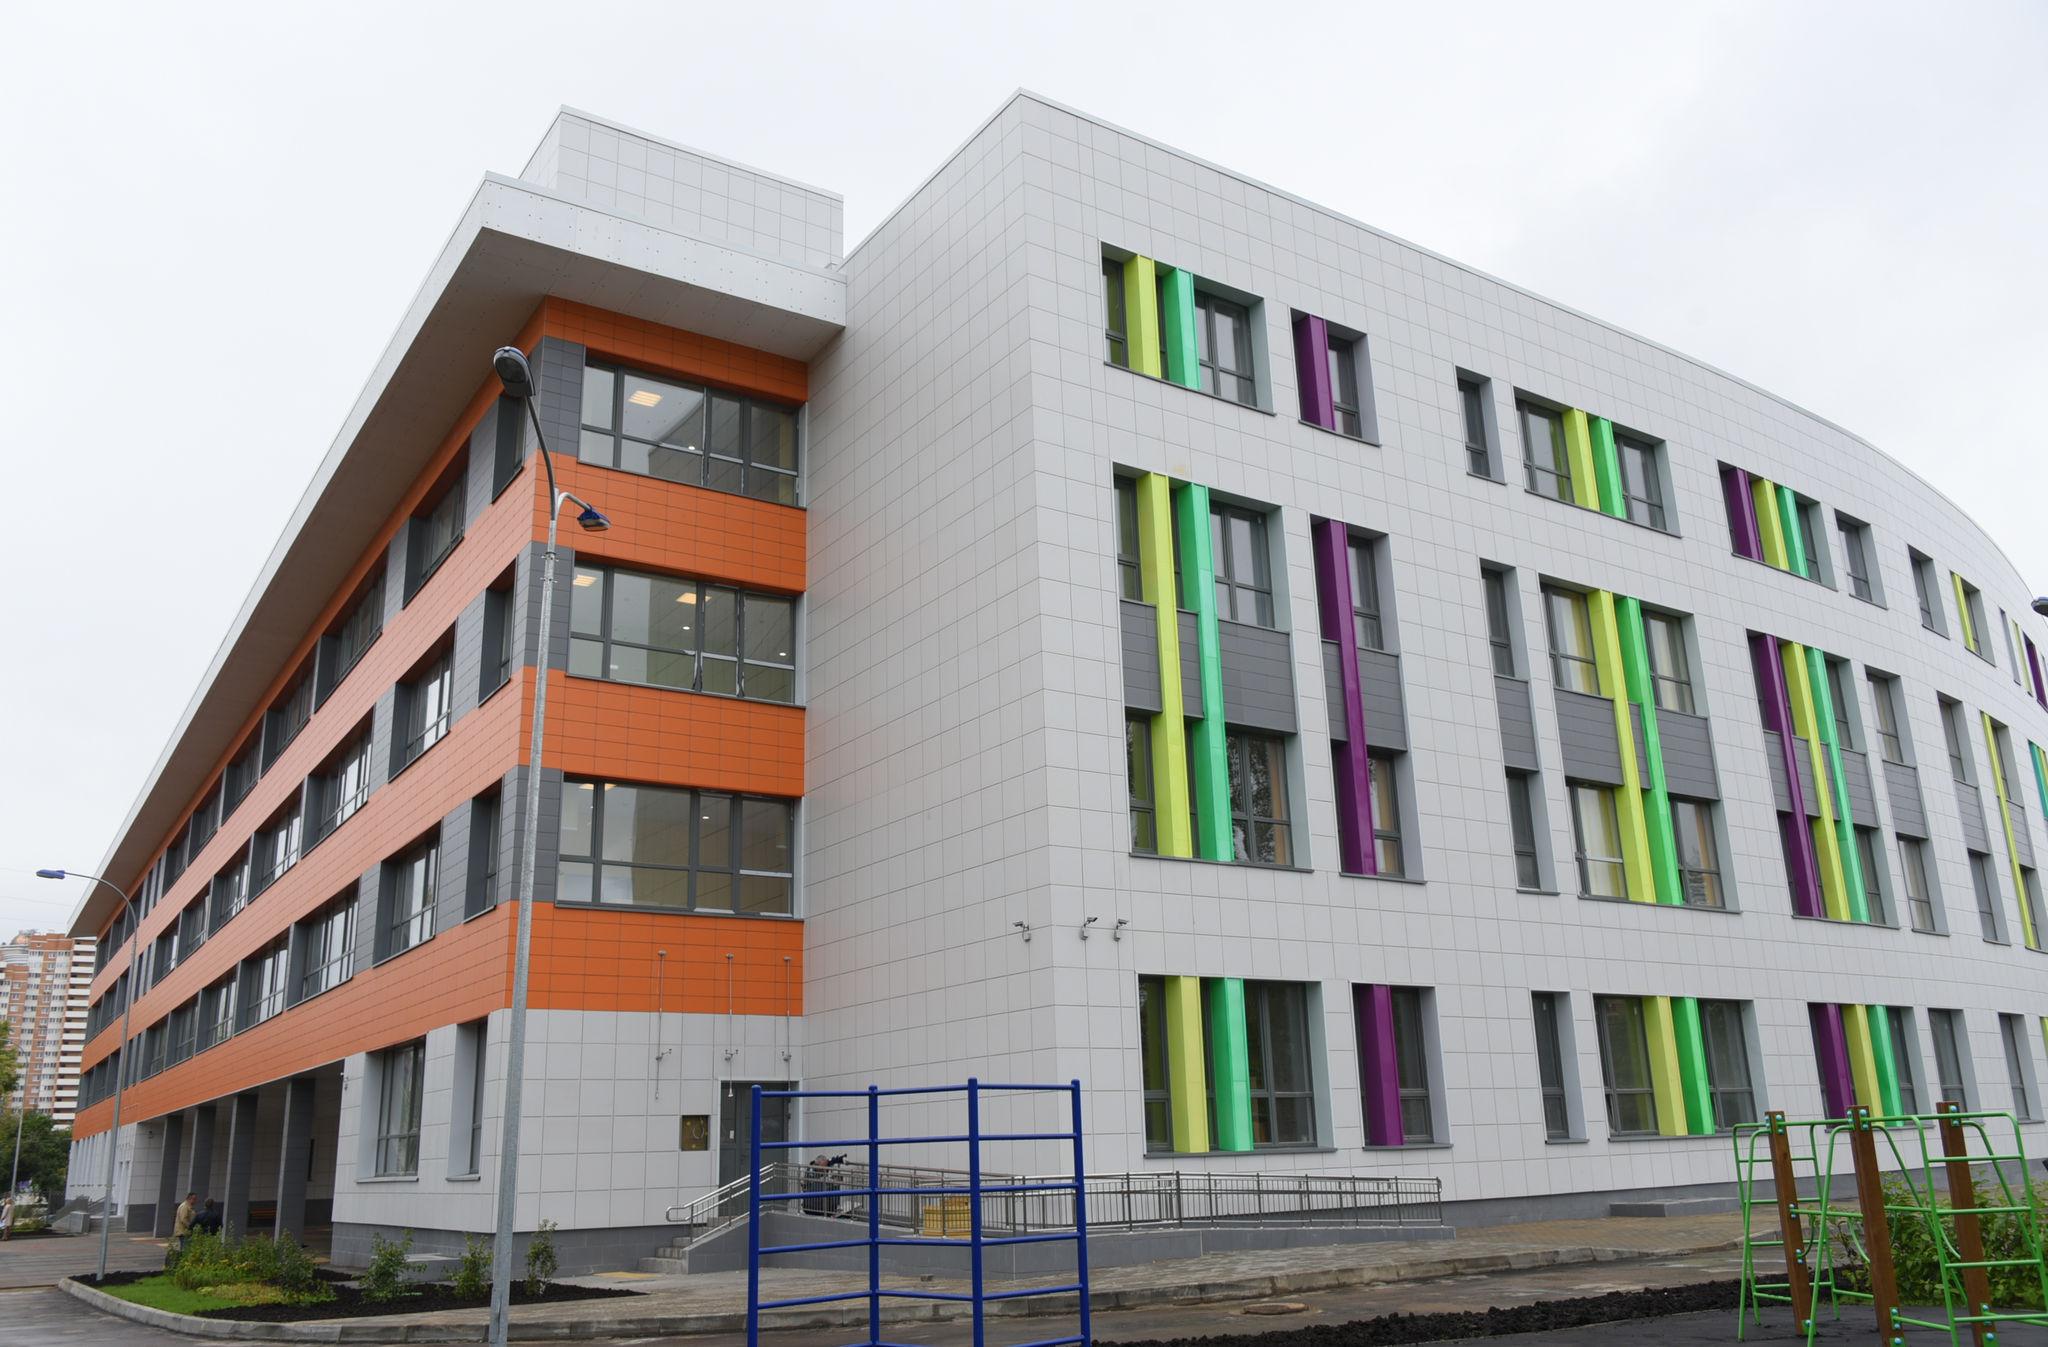 Школу и детский сада построят в Чертанове Северном